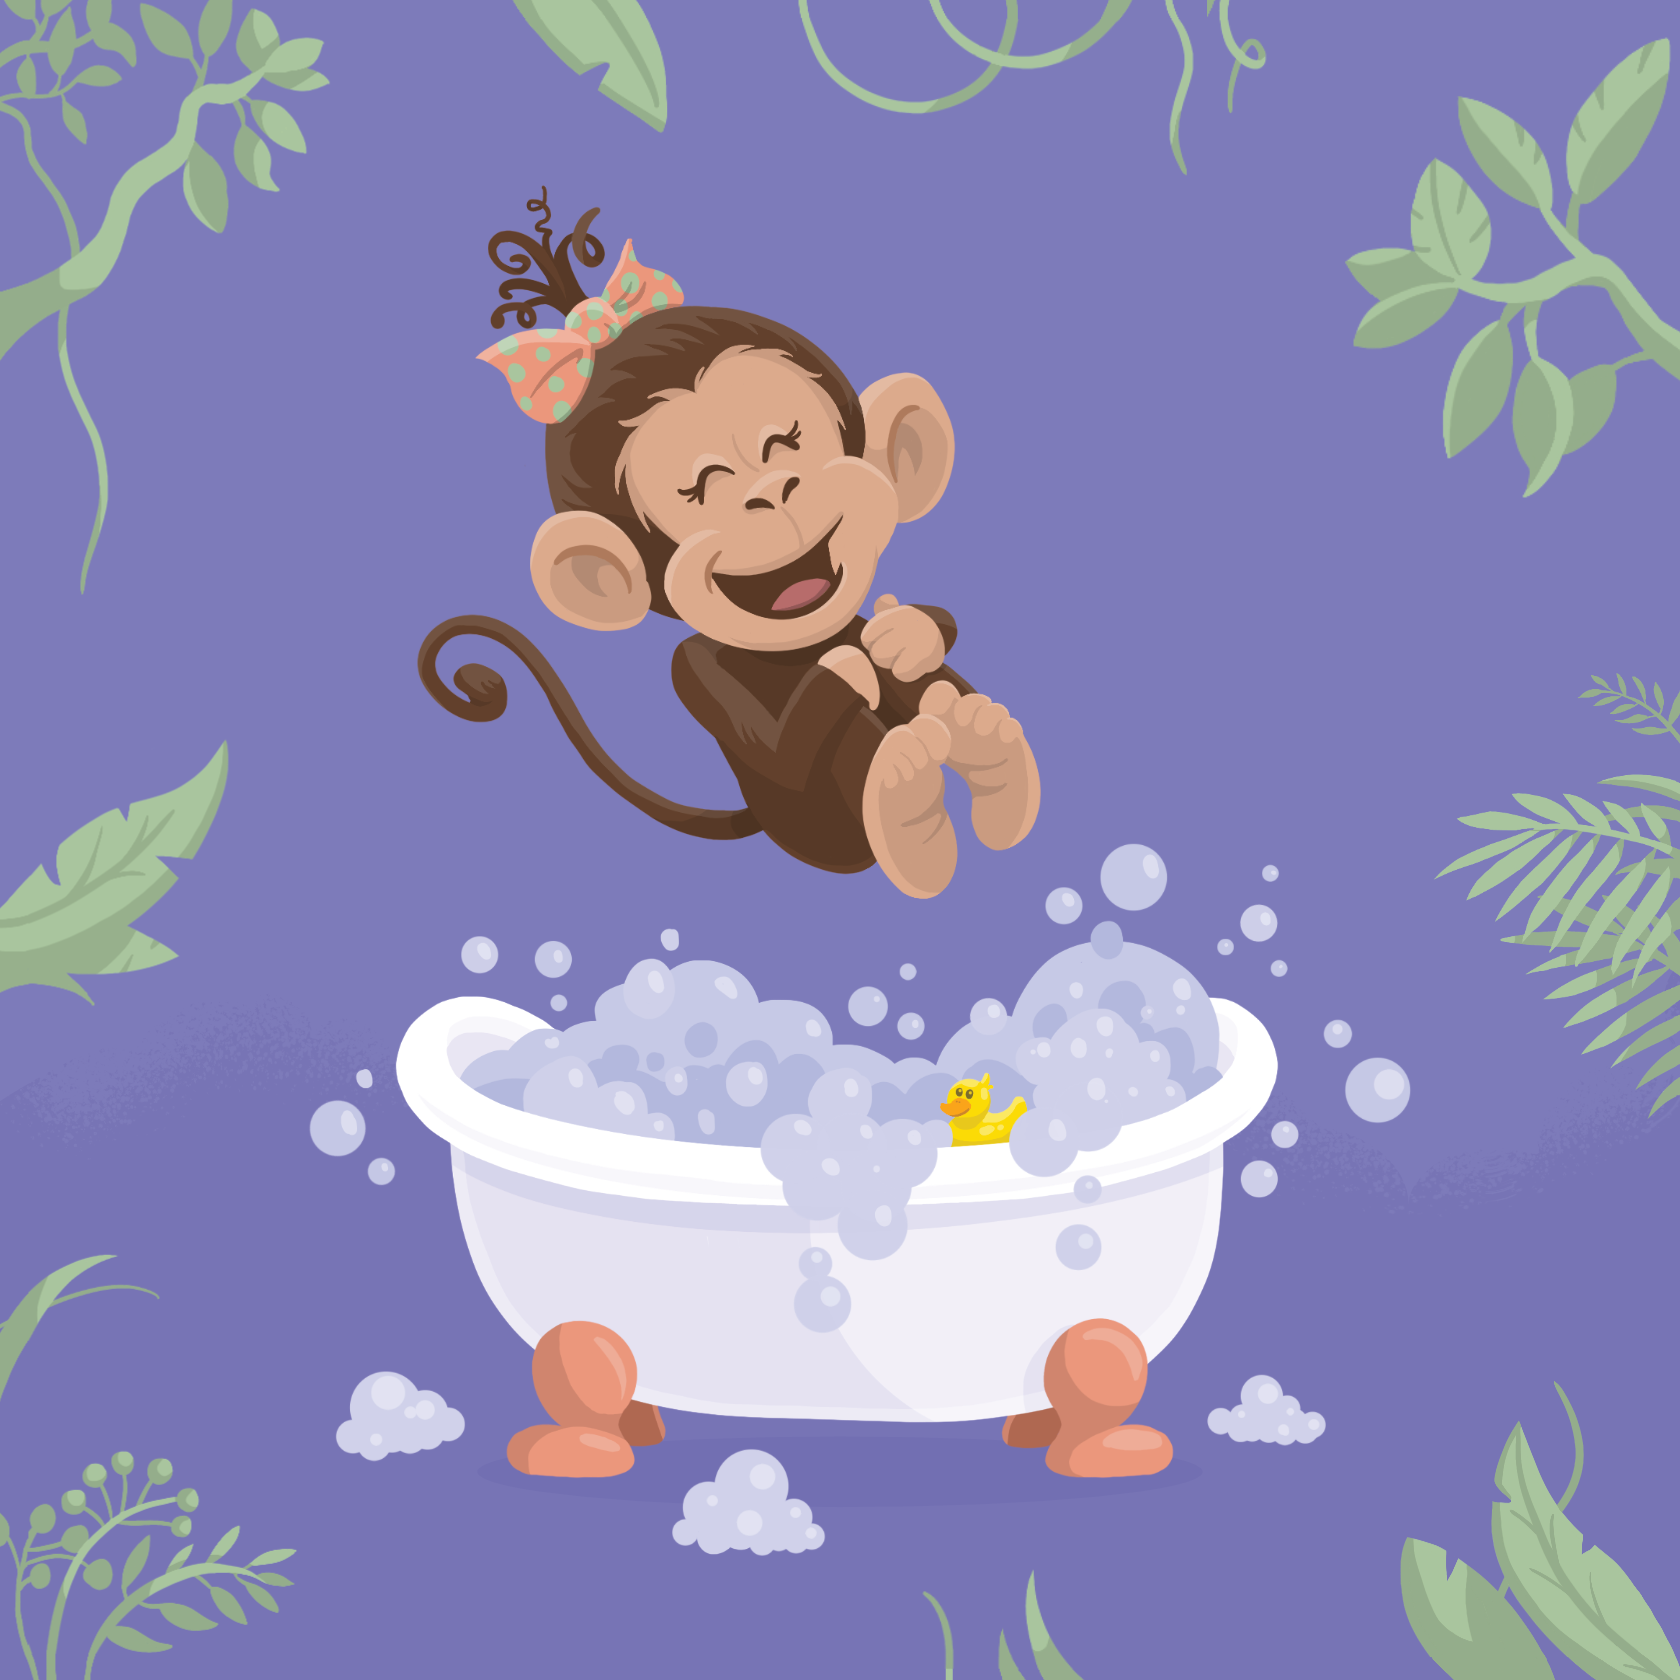 Baby shower invitation artwork baby girl monkey splashing into a bathtub in the jungle